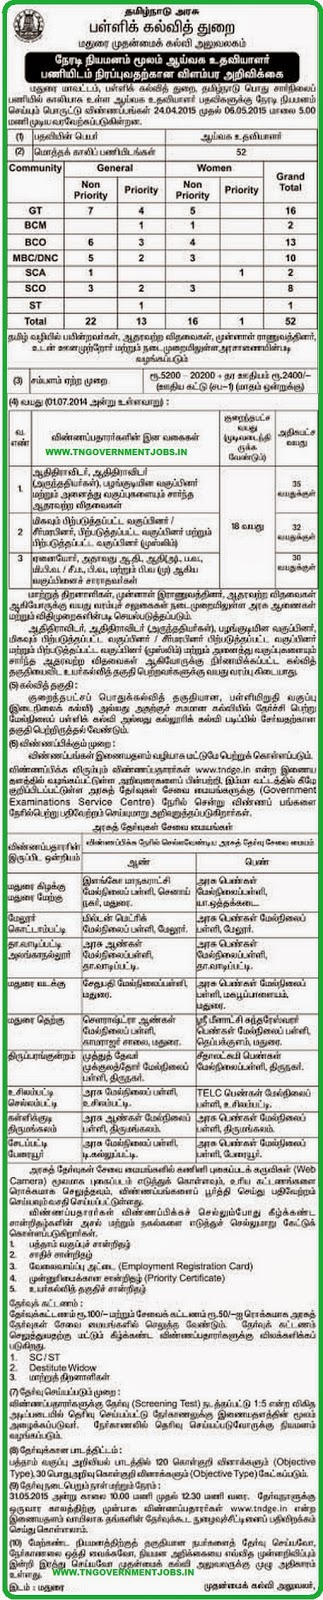 Madurai CEO Lab Asst Recruitments 2015 (www.tngovernmentjobs.in)